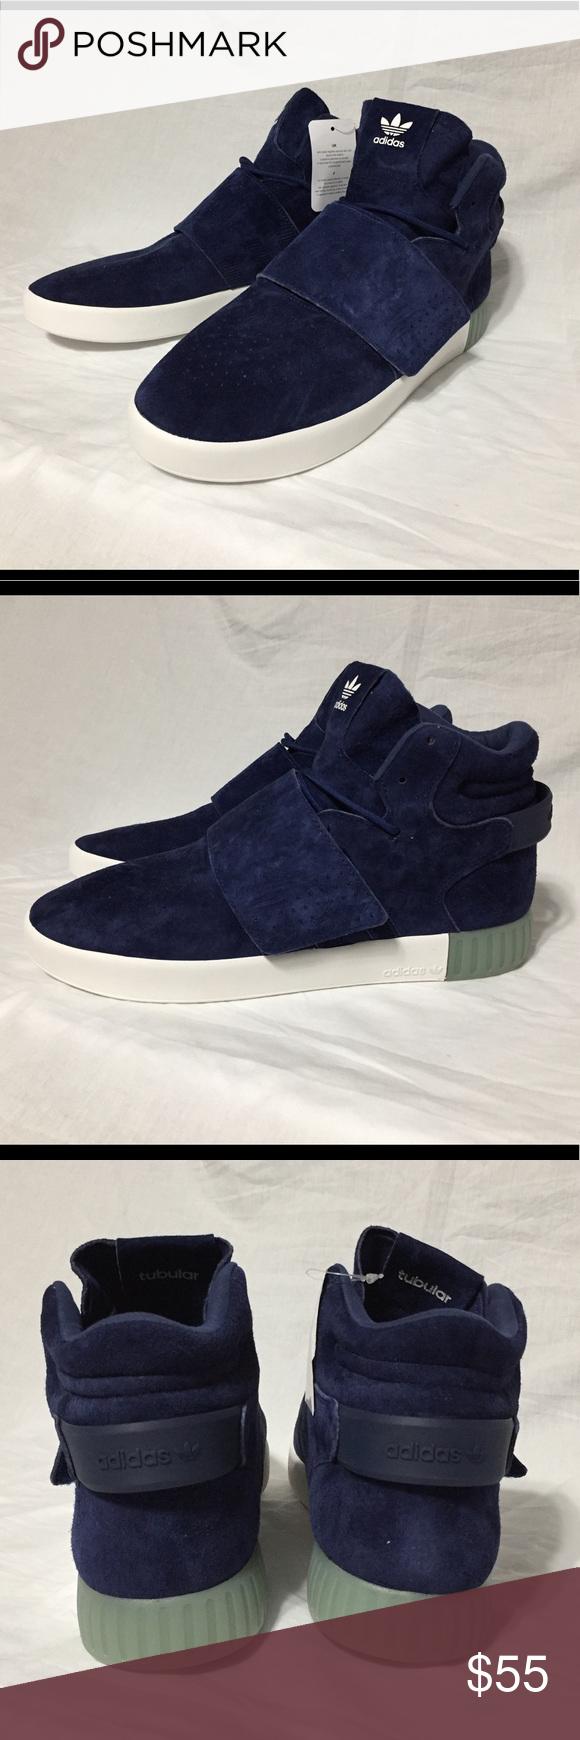 Digital Cadena Mount Bank  Adidas Tubular Invader Blue Suede Strap Shoes NWT | New adidas shoes, Blue  suede, Strap shoes